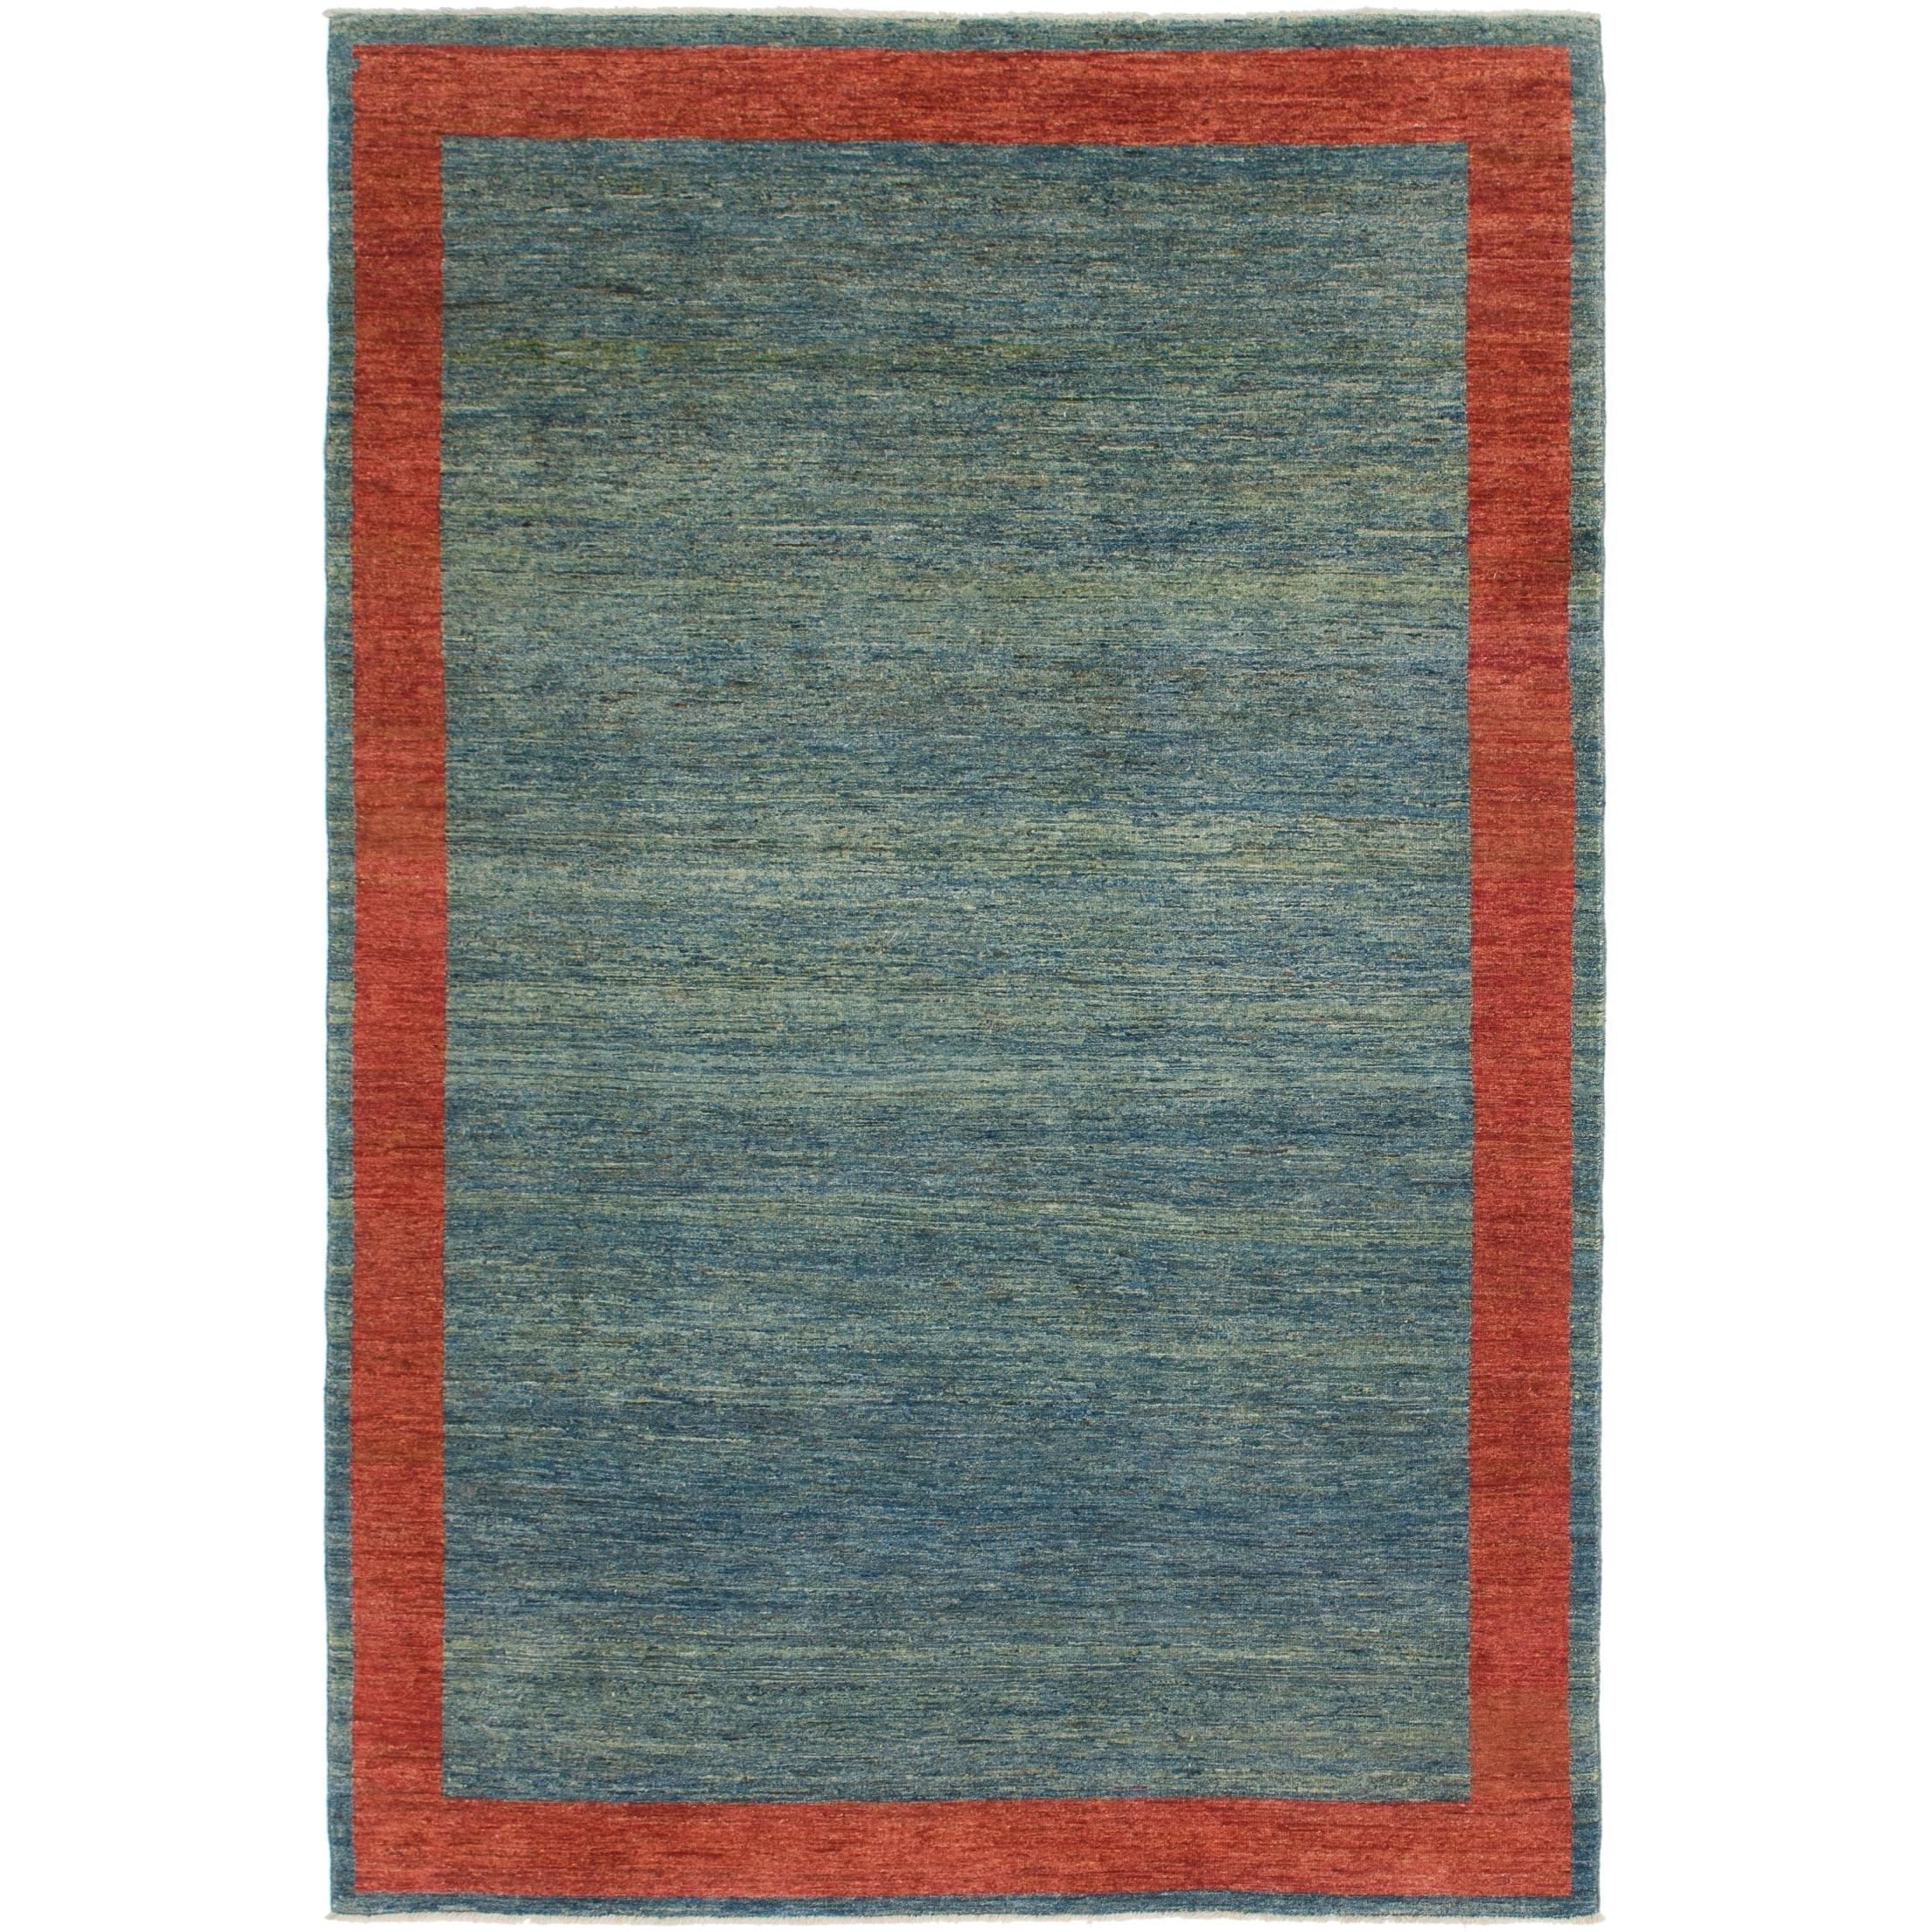 Hand Knotted Kashkuli Gabbeh Wool Area Rug - 6 4 x 9 8 (Blue - 6 4 x 9 8)